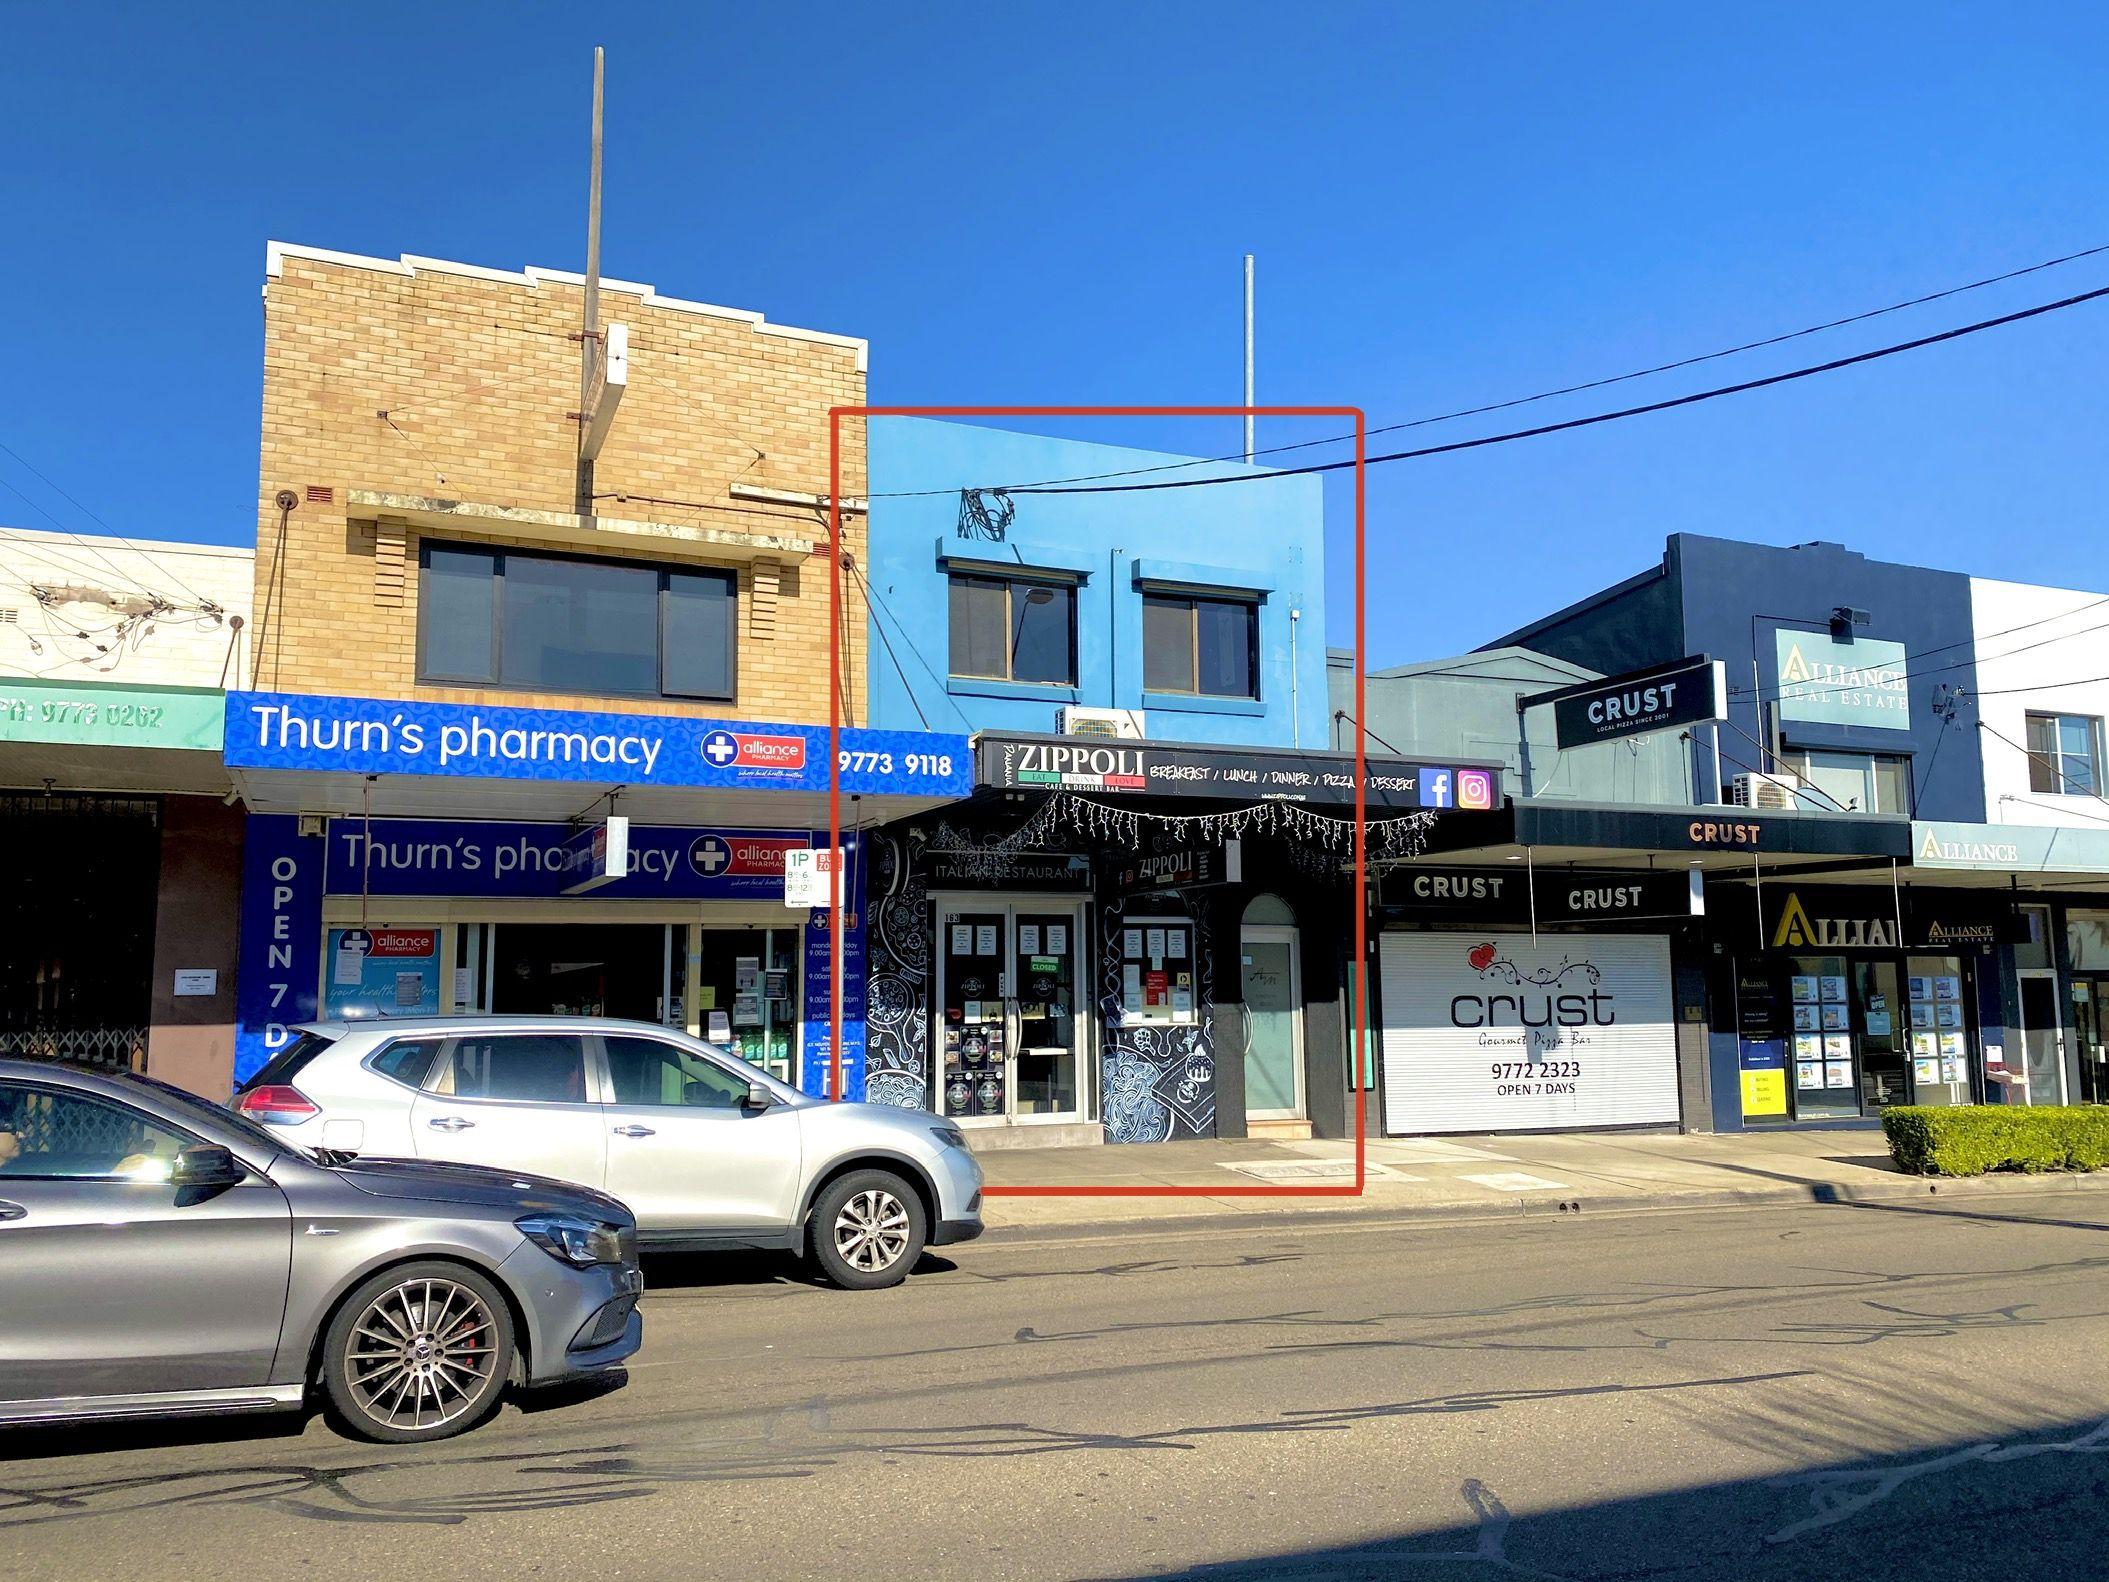 Level 1/163 Tower Street, Panania NSW 2213